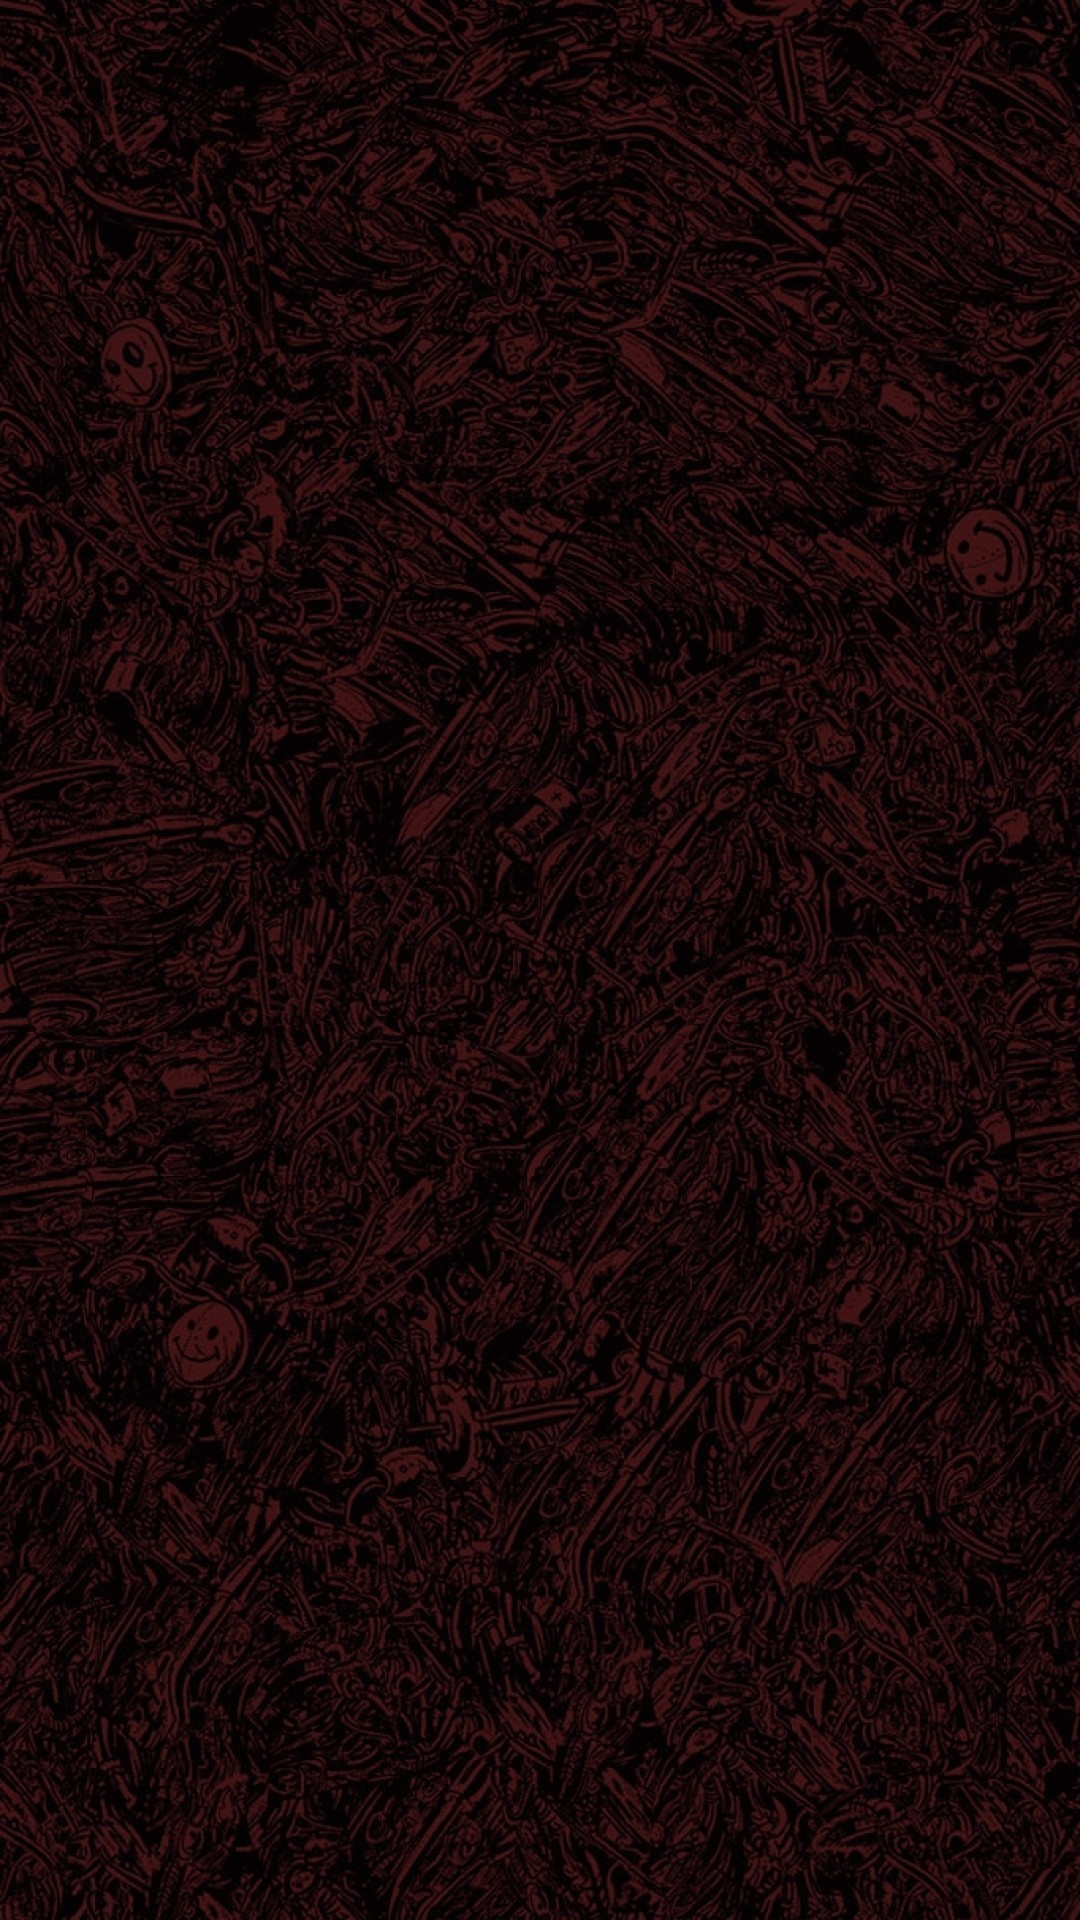 74 dark maroon 74 dark maroon